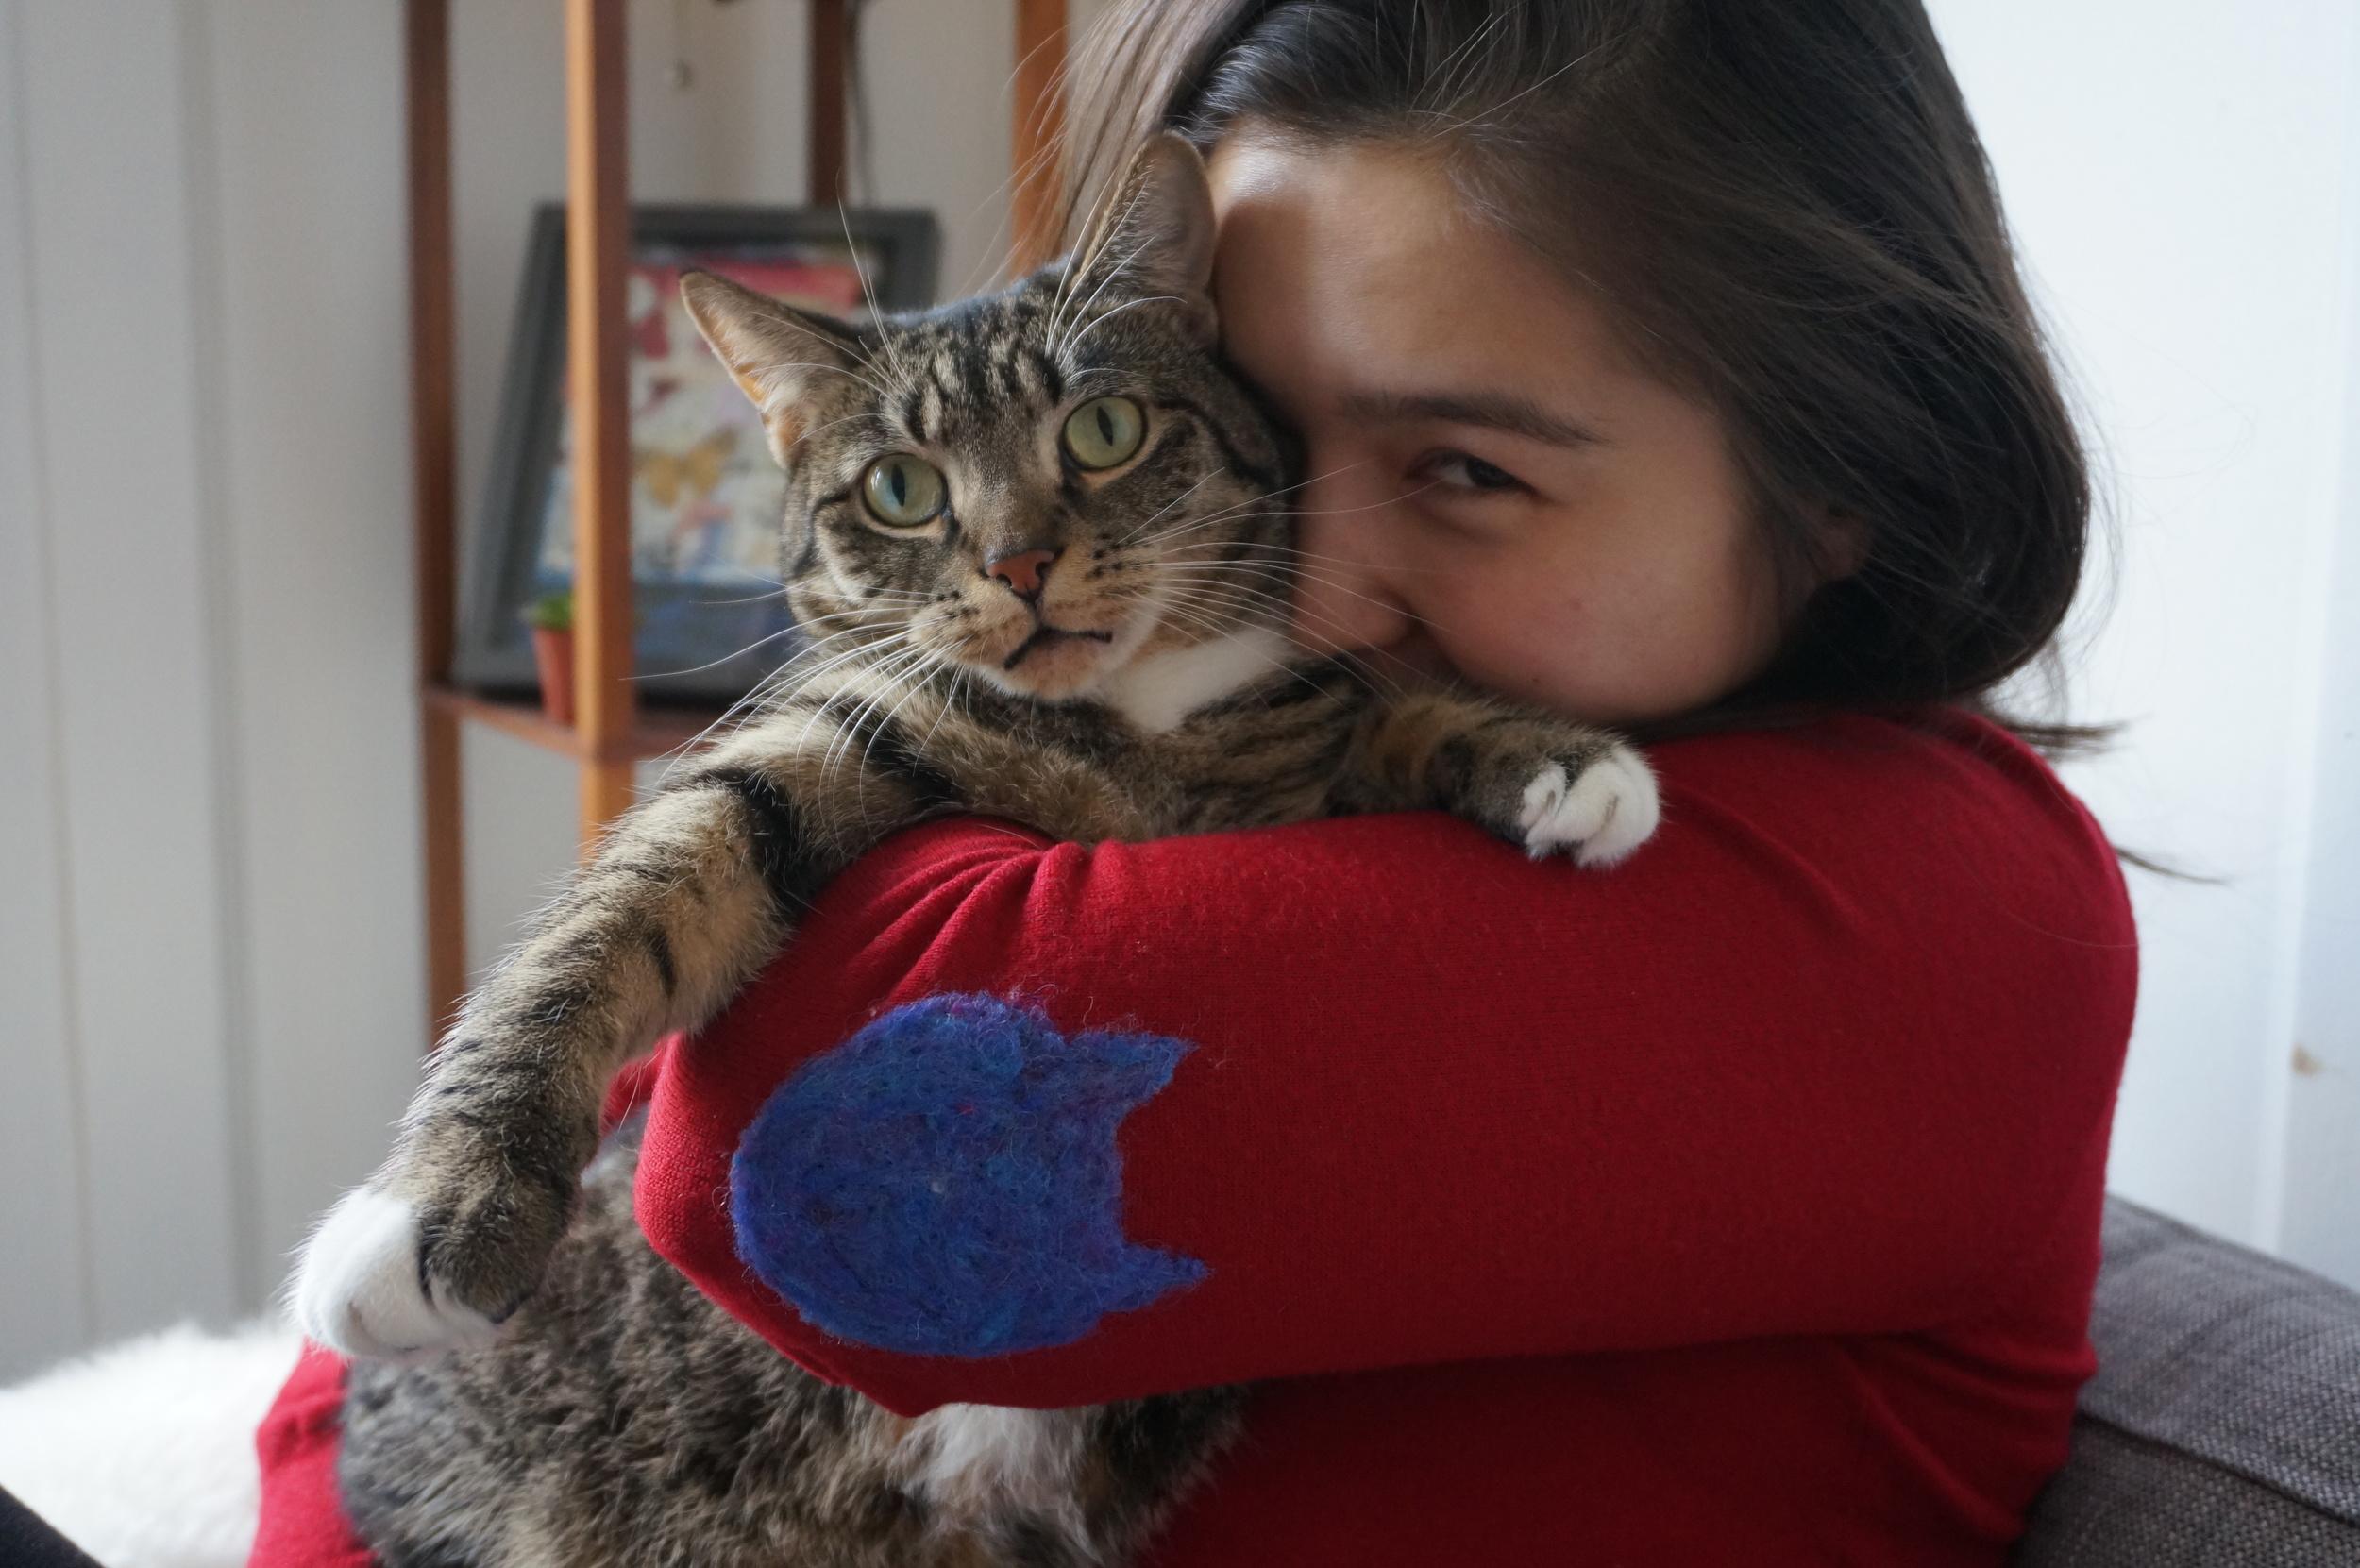 Ta-Da! Unimpressed cat holding is optional